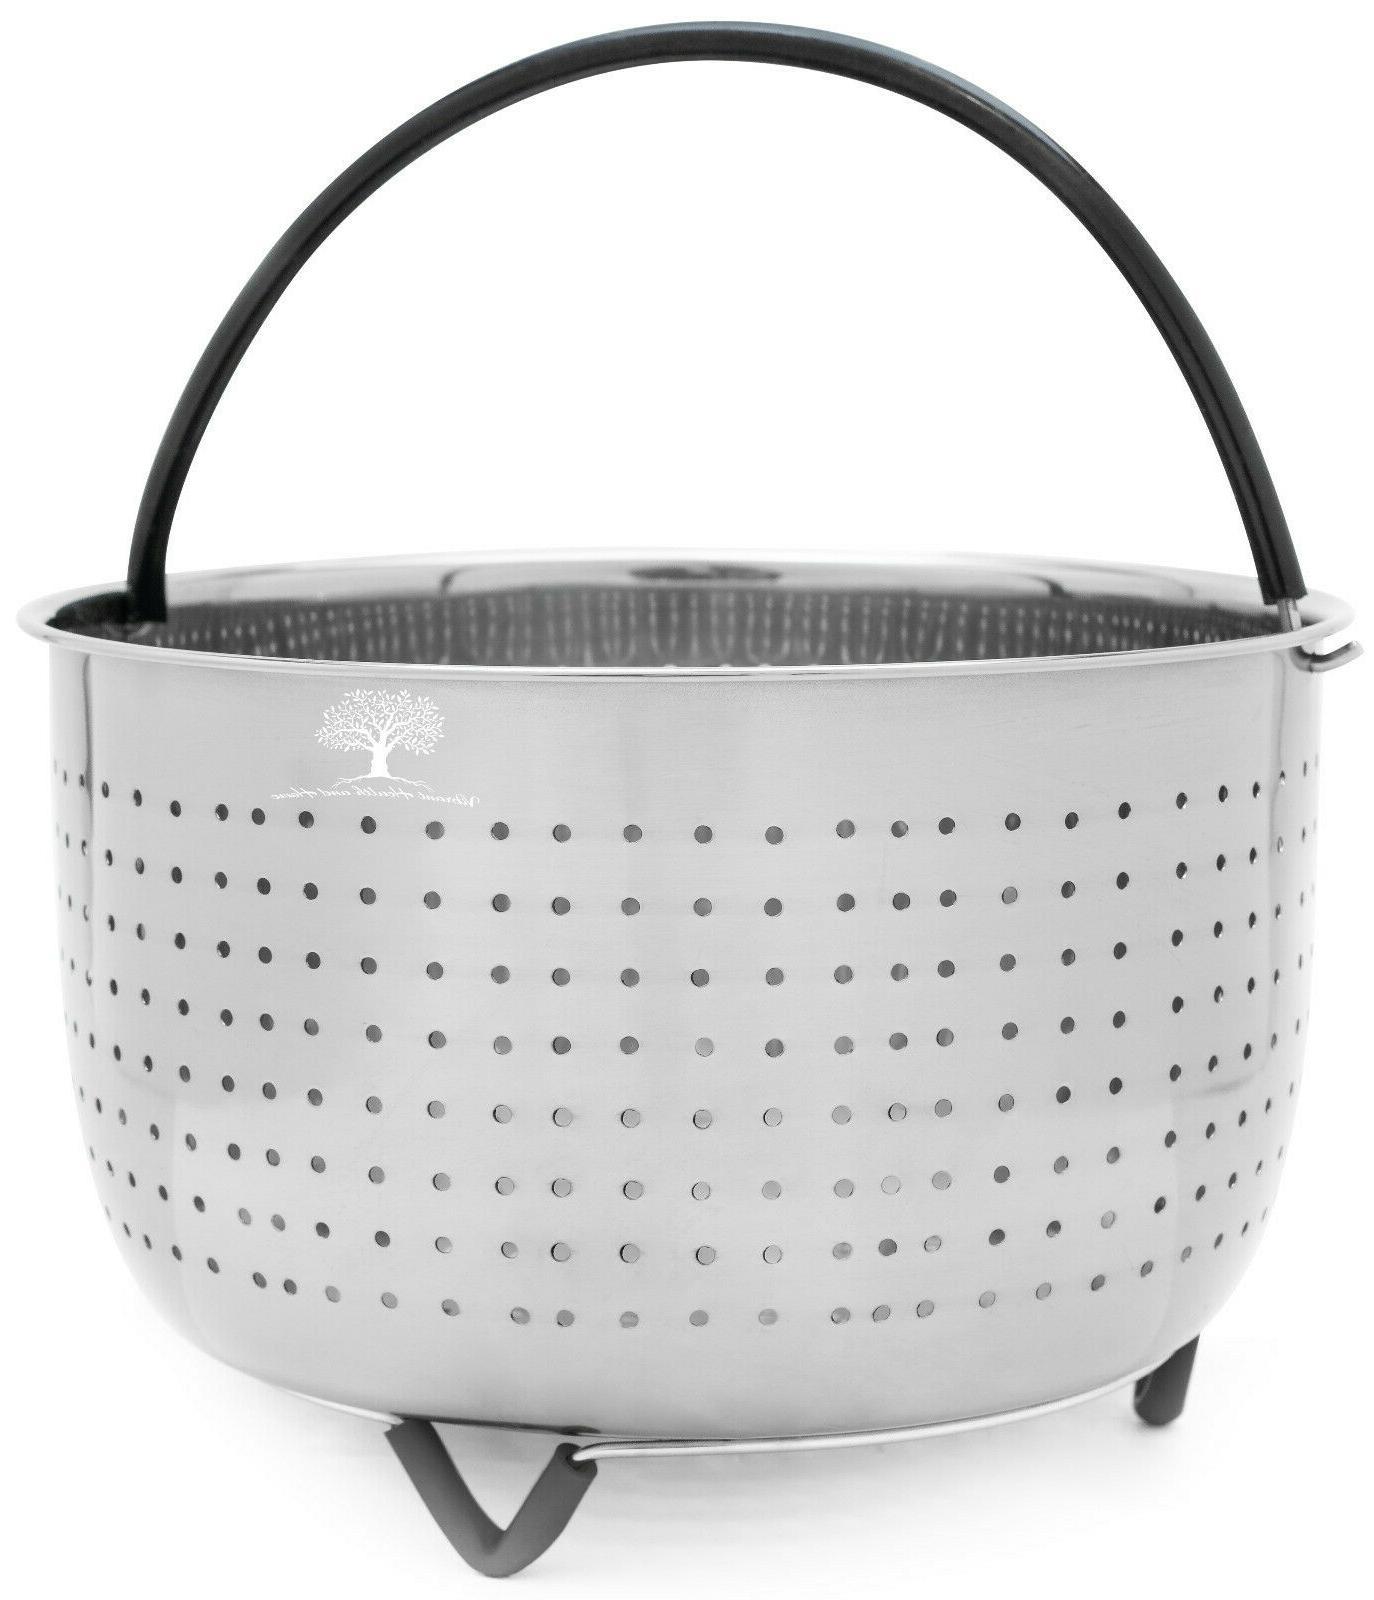 Pressure Cooker Accessories 6 QT Steamer Basket for Instant